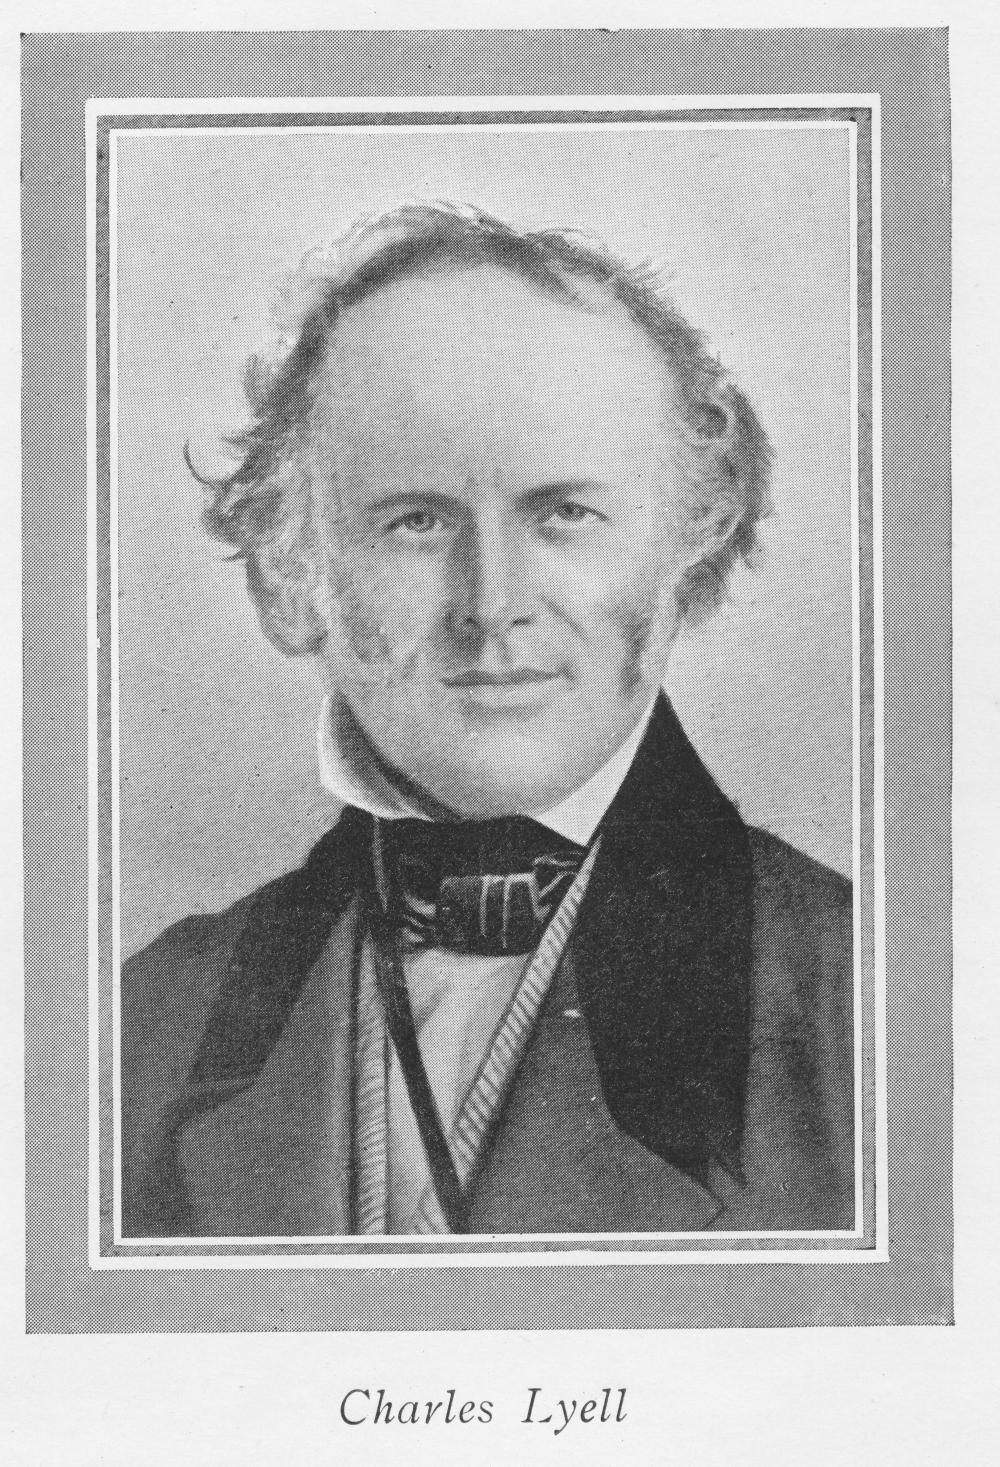 Charles Lyell  Simple English Wikipedia the free